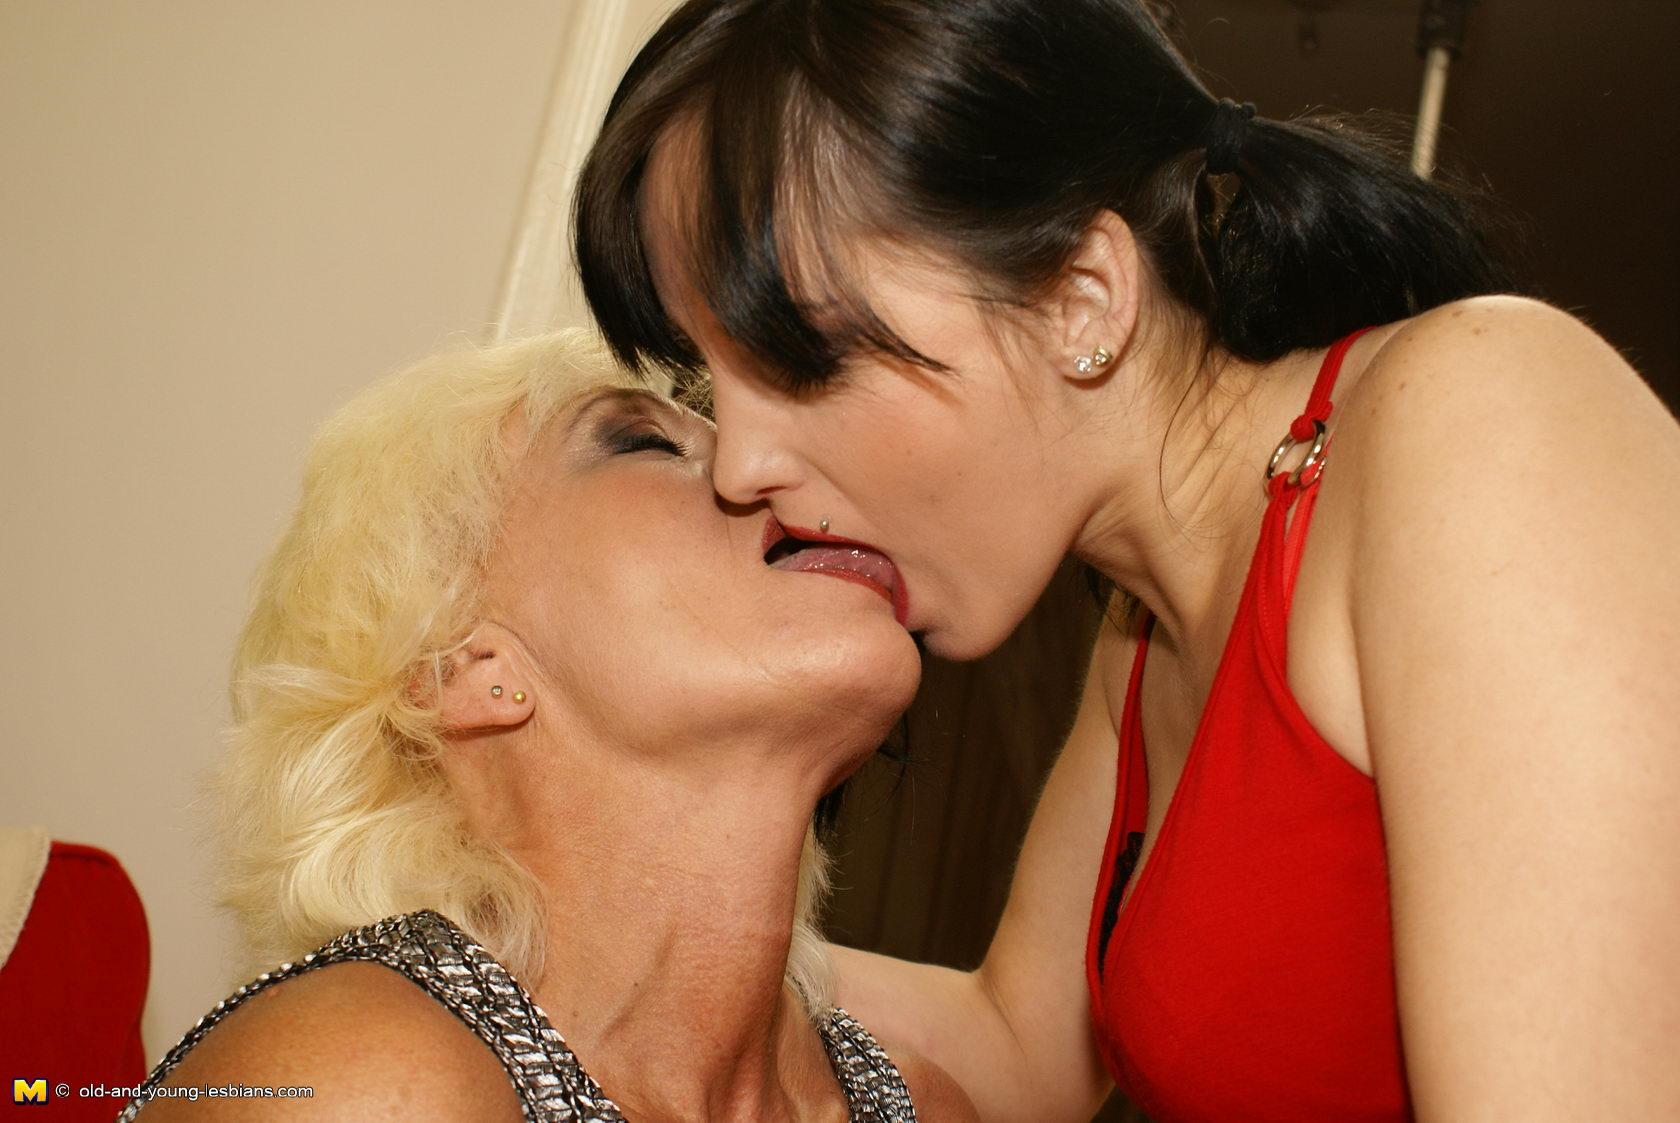 Lesbians kissing mature nude